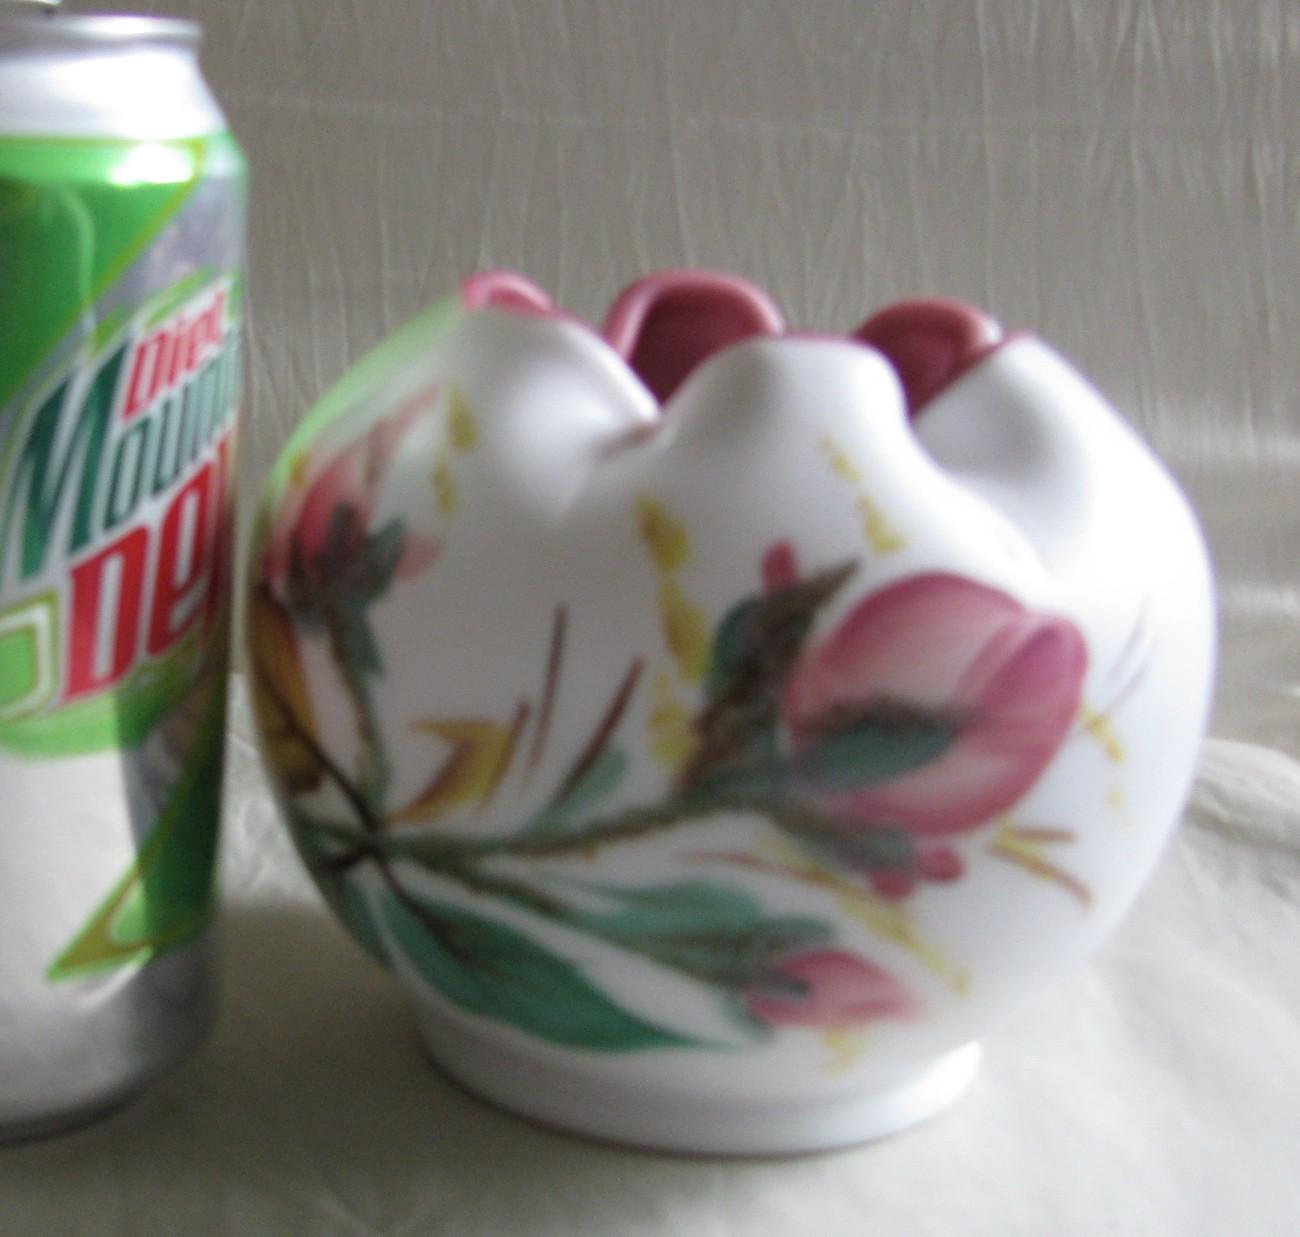 Wright/Fenton Peach Blow Rose Bowl w/hp 'Moss Roses' dec.